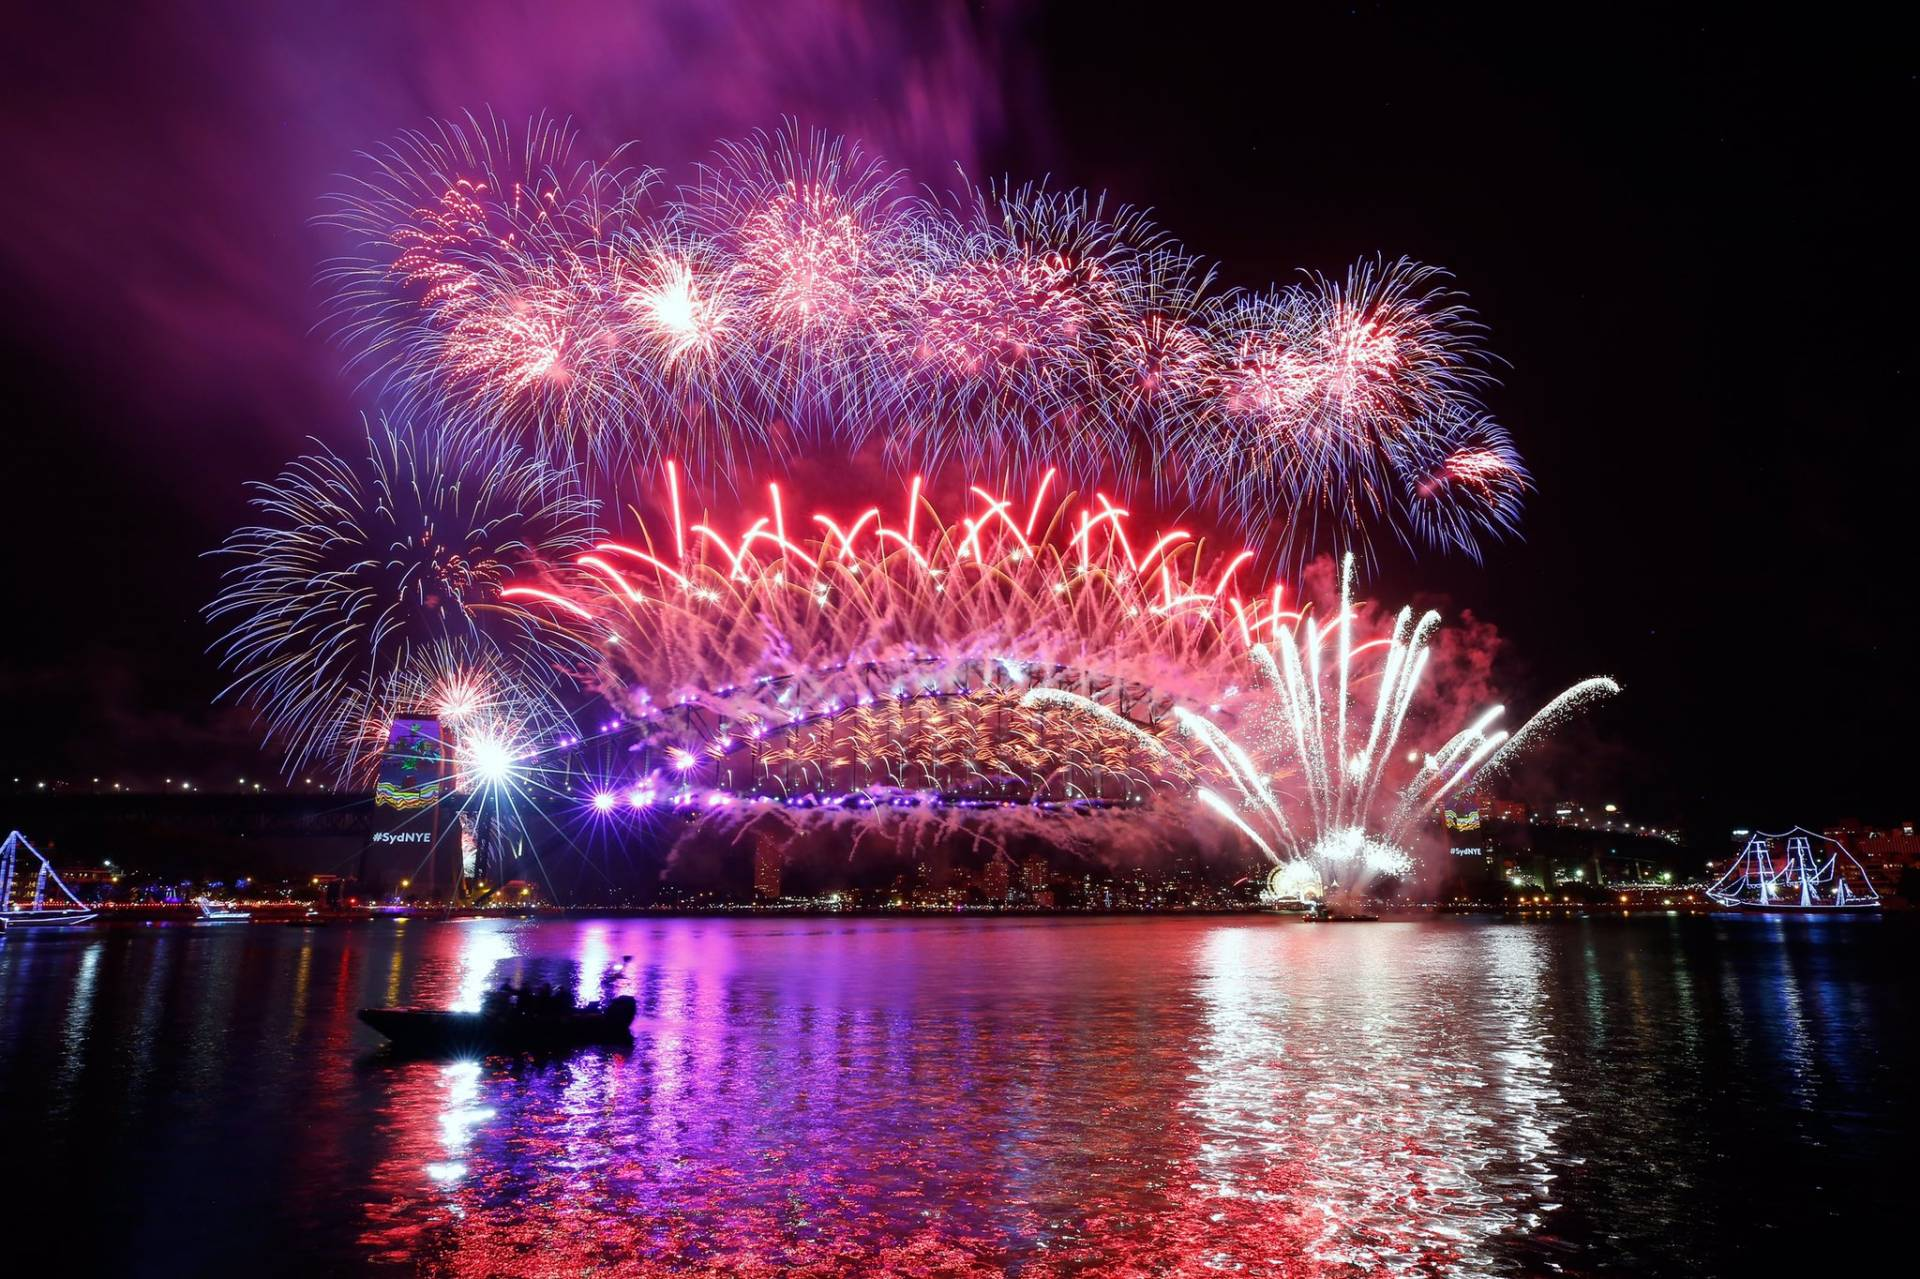 New Year's Eve in Australia